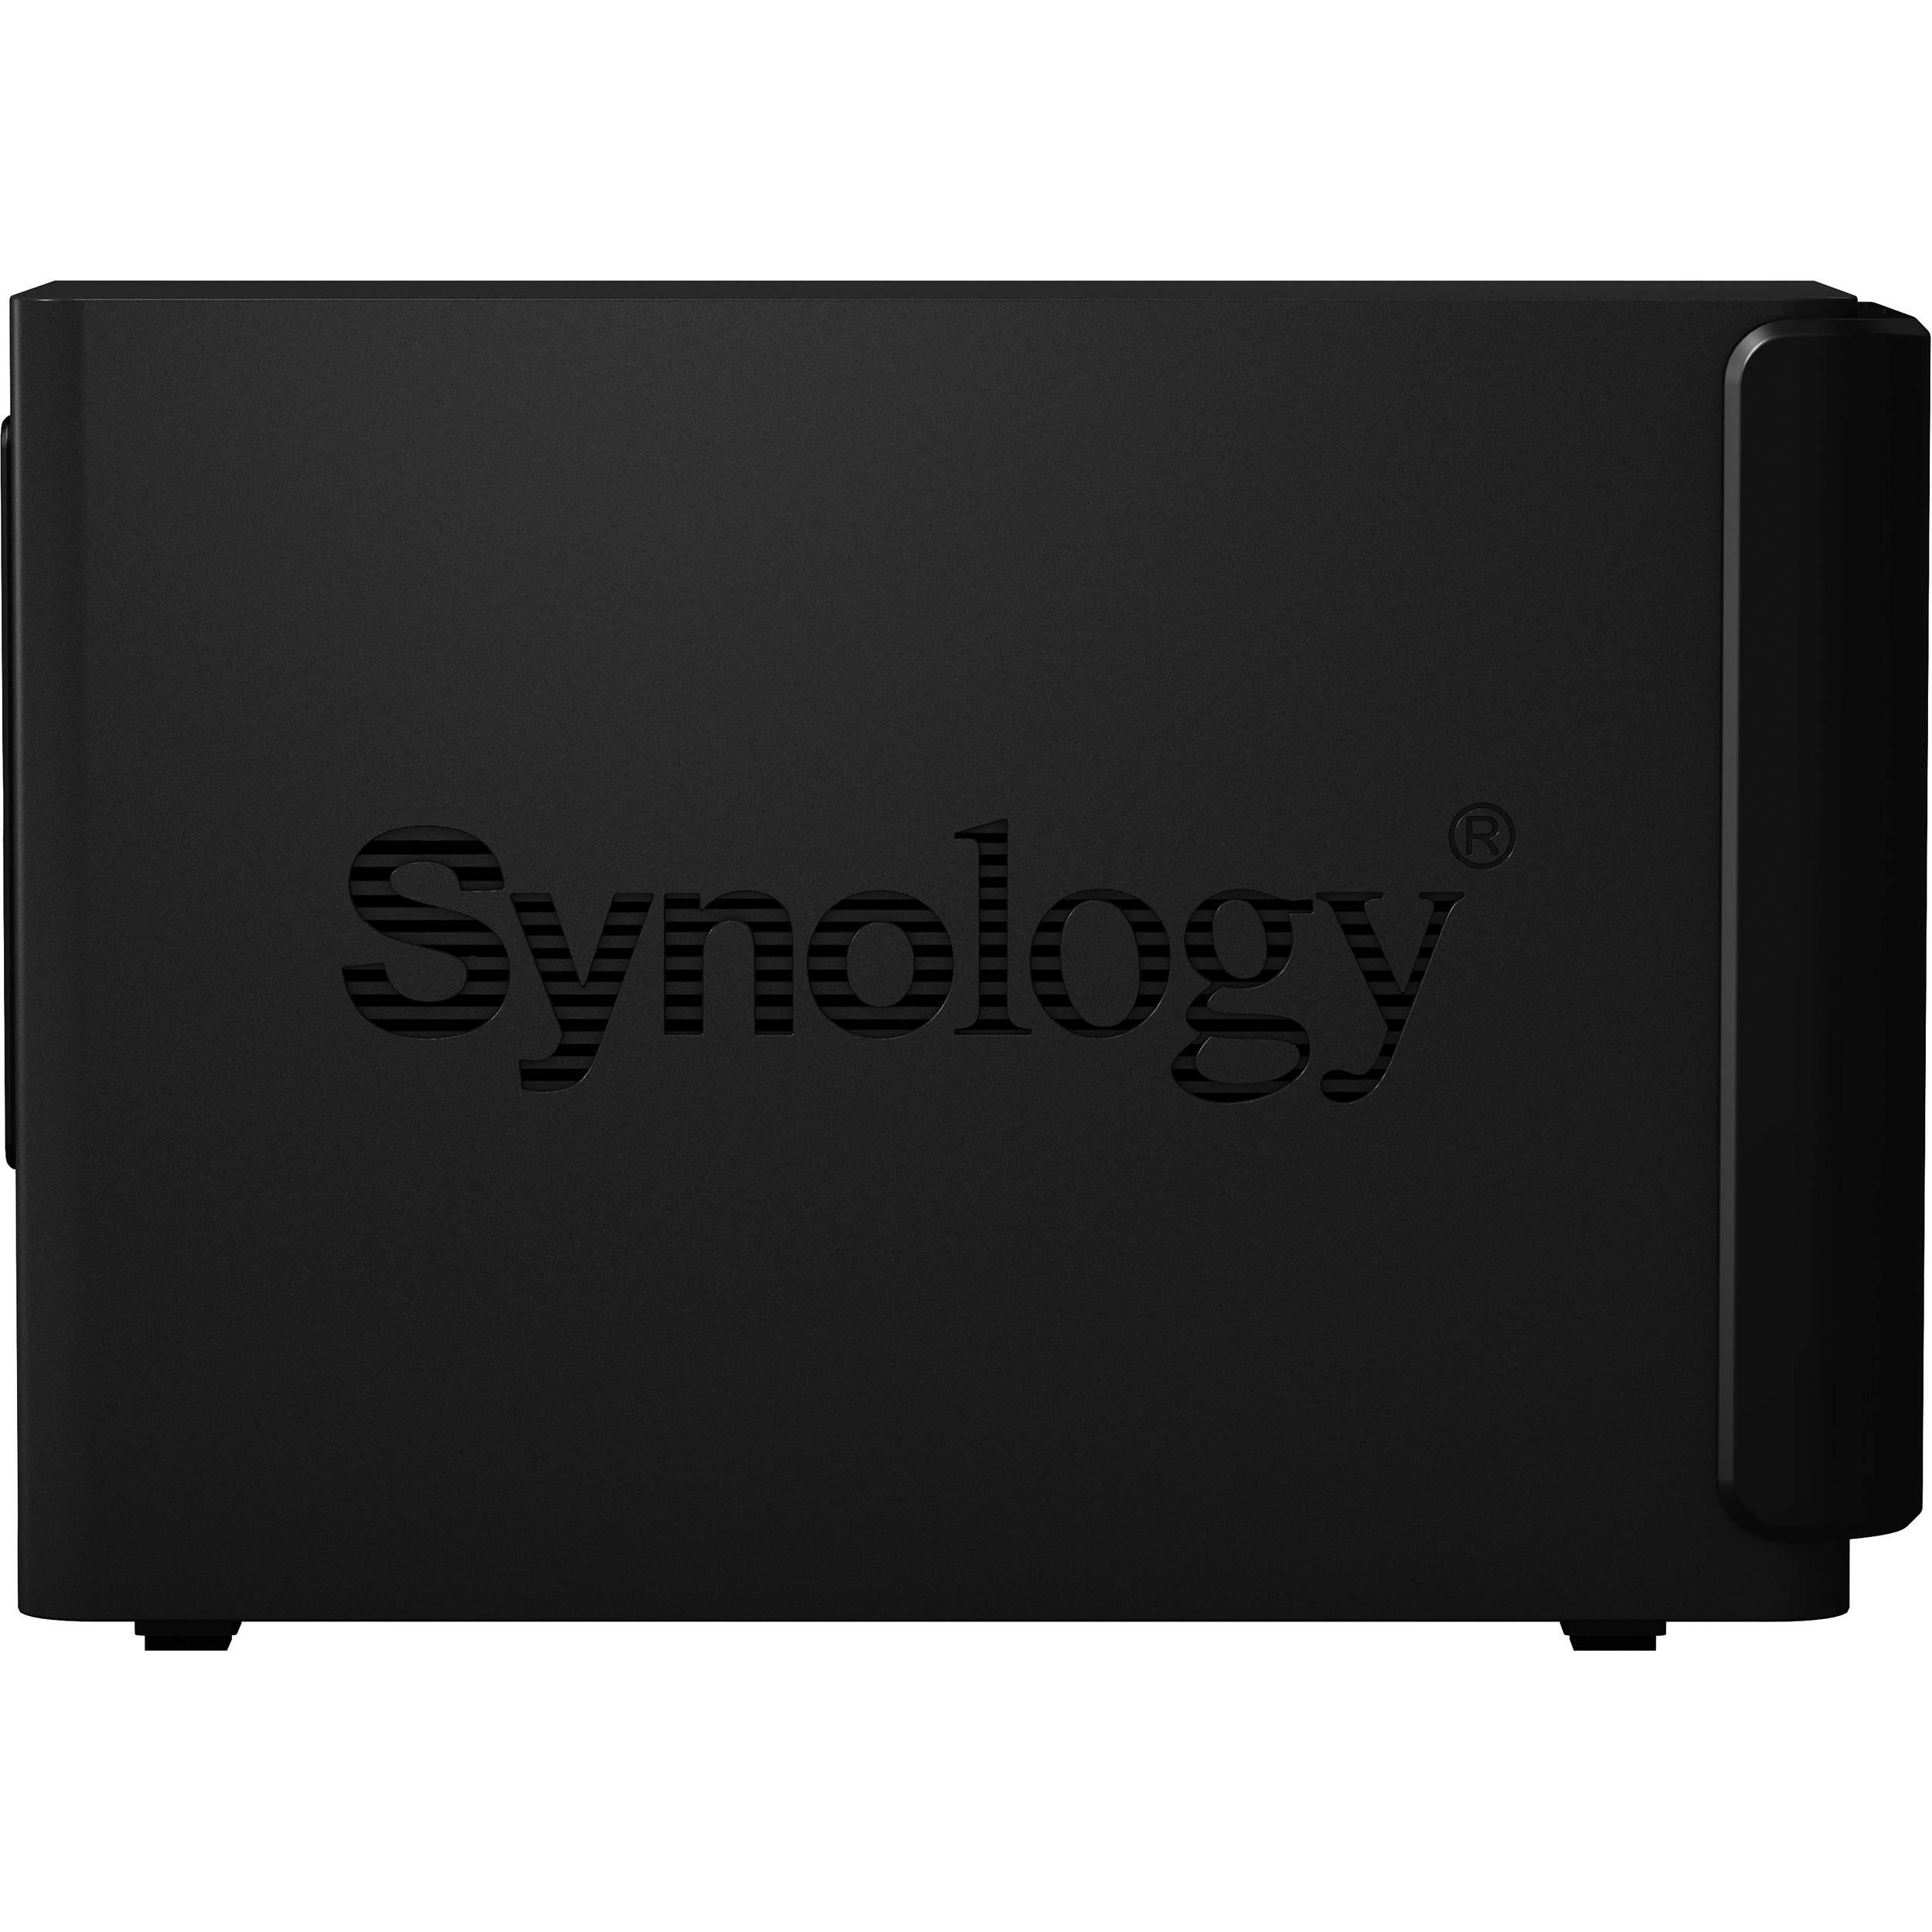 Synology DiskStation DS212+ 2-Bay NAS Server for Business